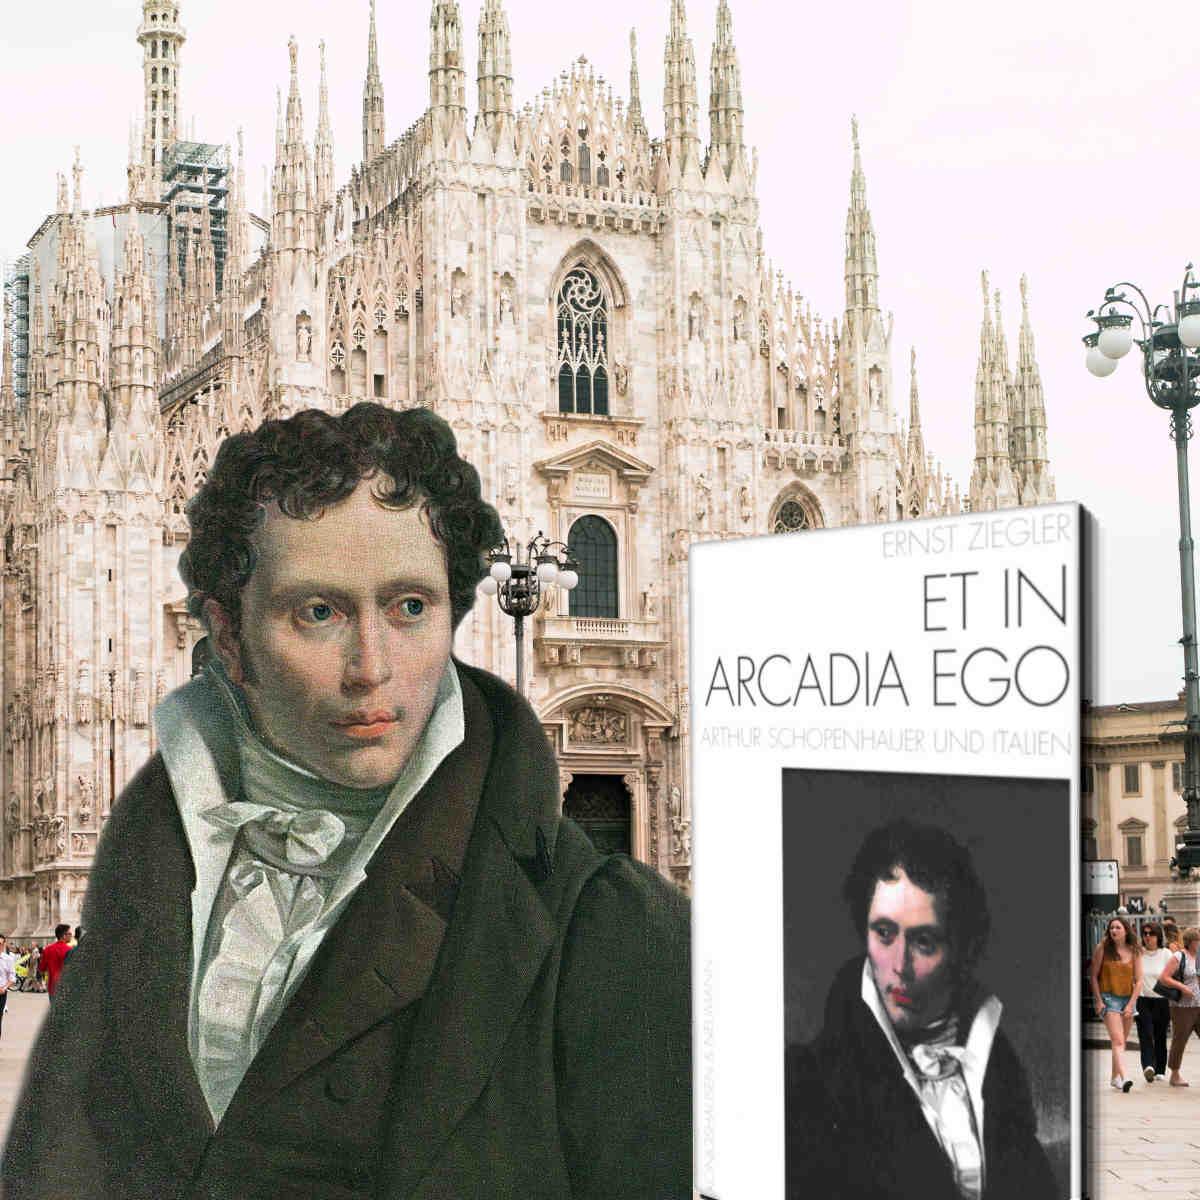 schopenhauer_italien_ziegler_arcadia_ego_rezension